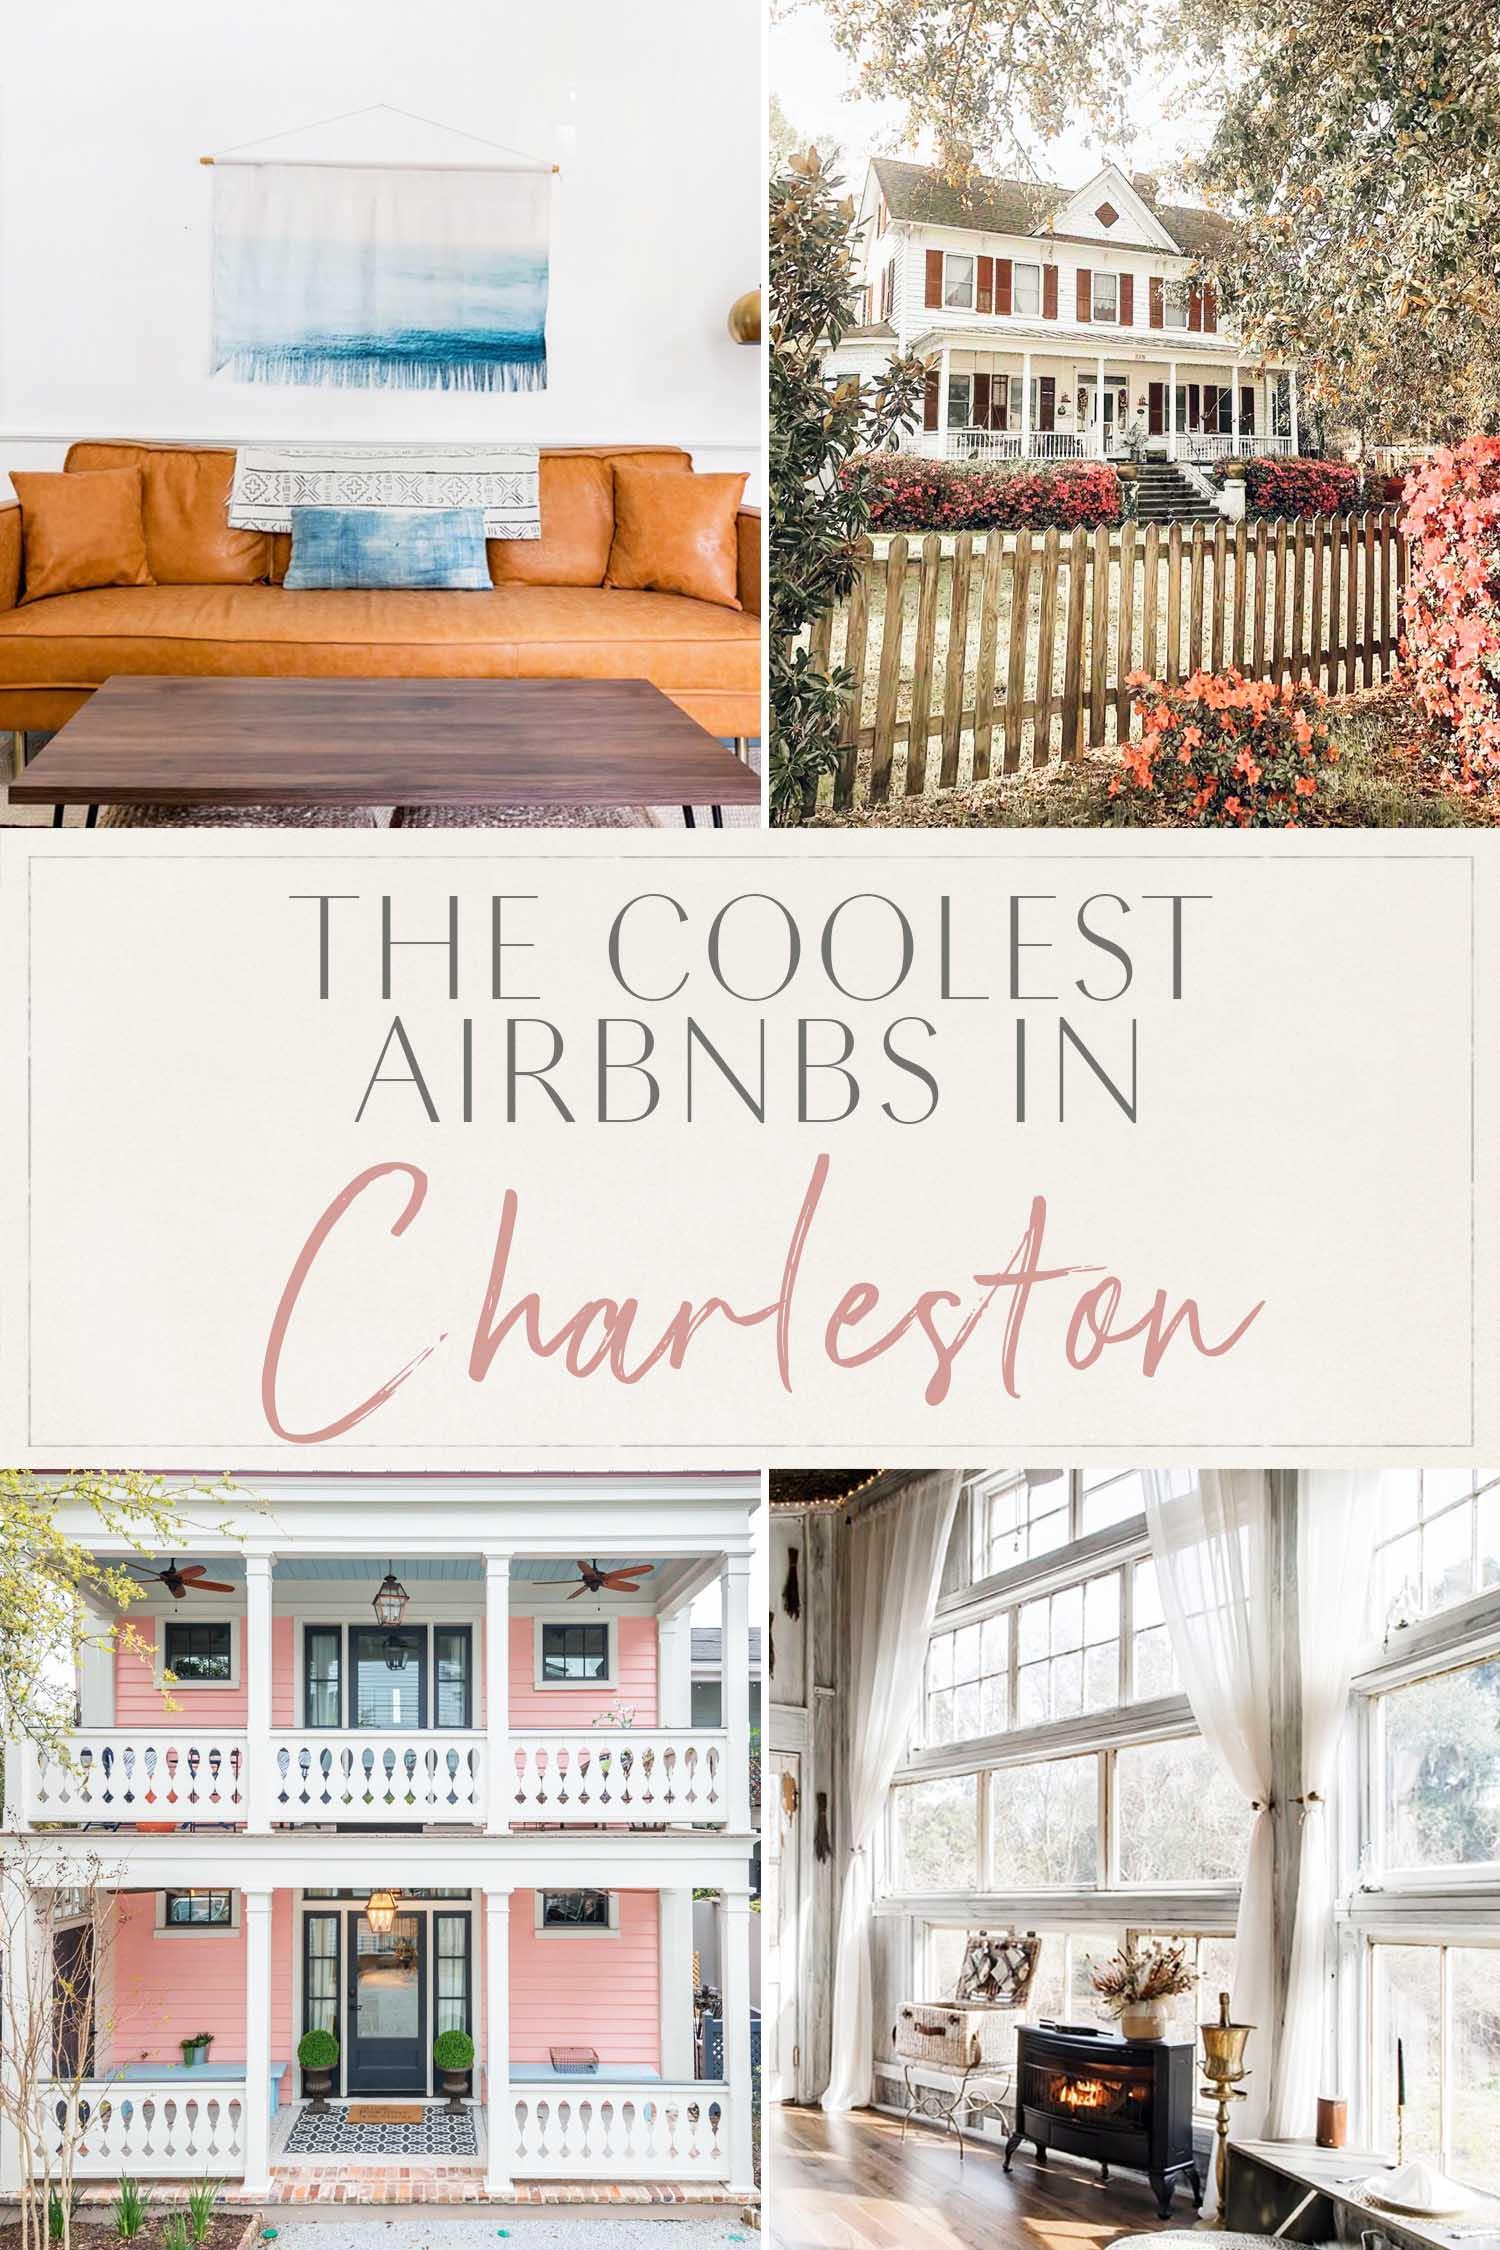 Coolest Airbnbs Charleston